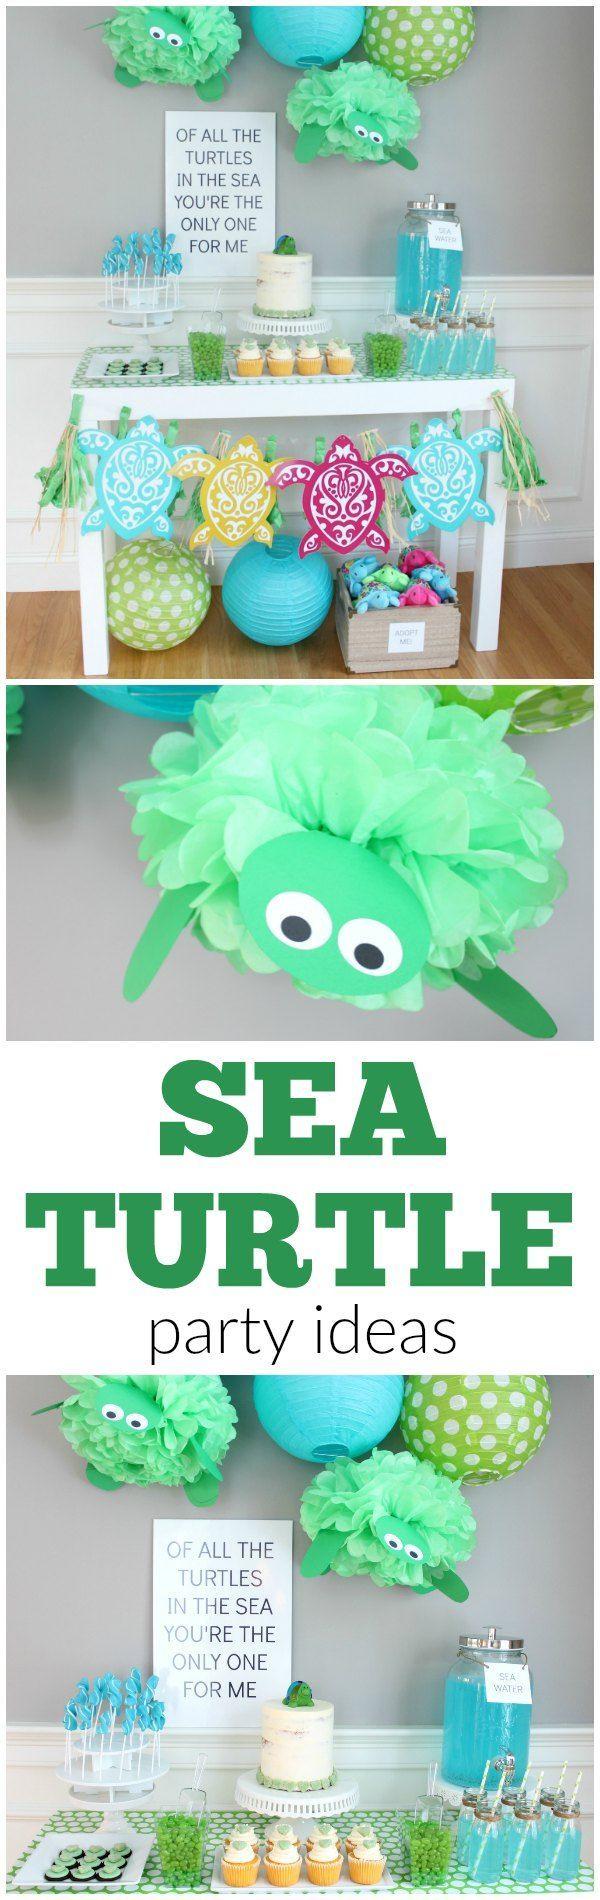 Sea Turtle Birthday Party Ideas